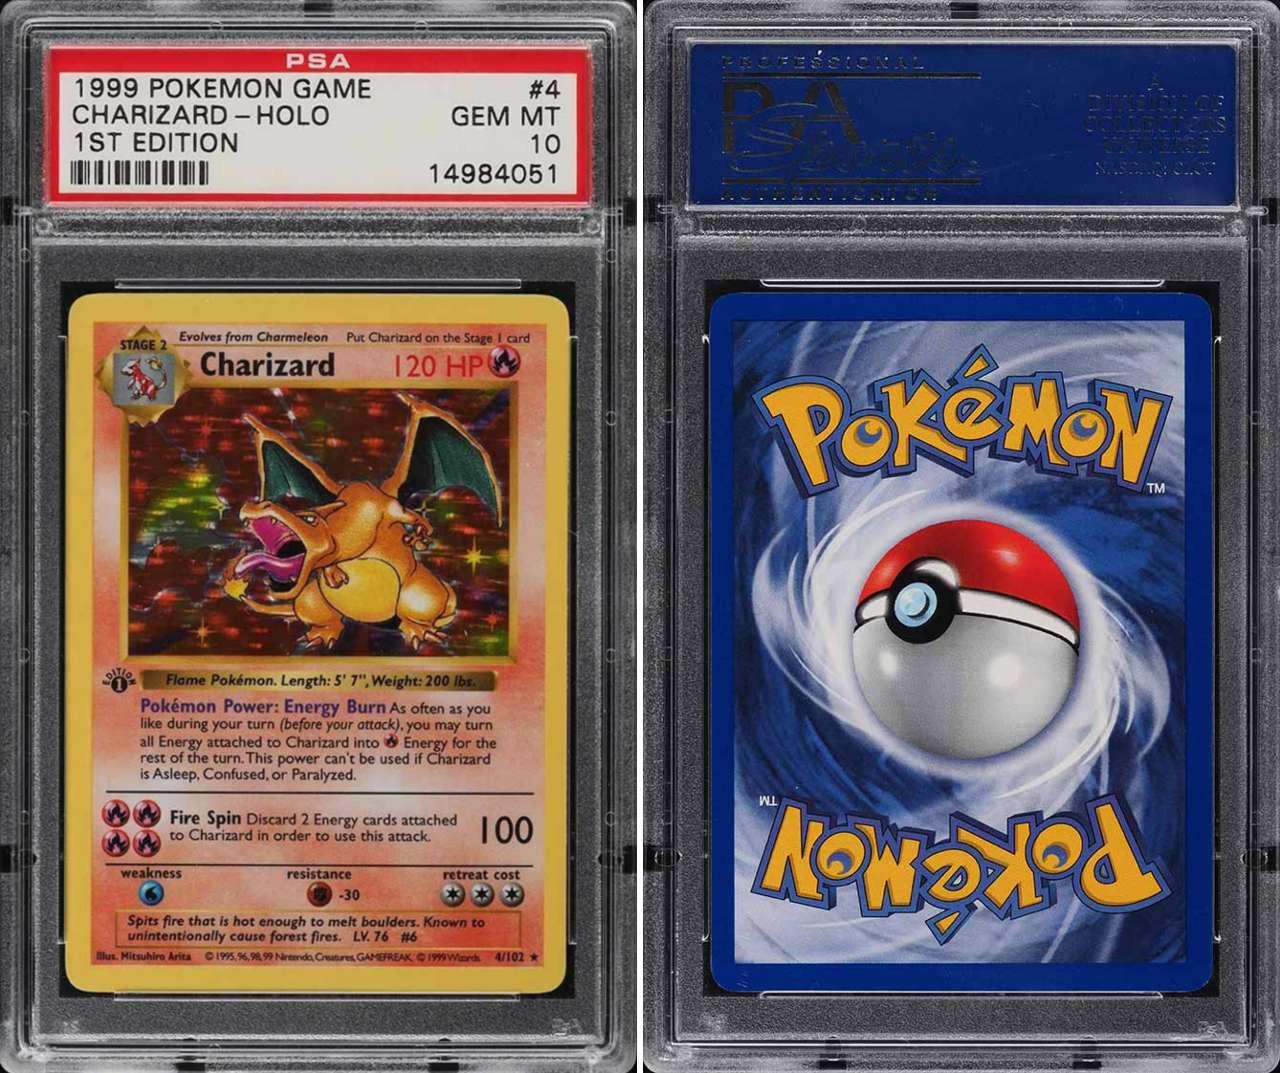 Pokémon holograma Charizard subasta dólares